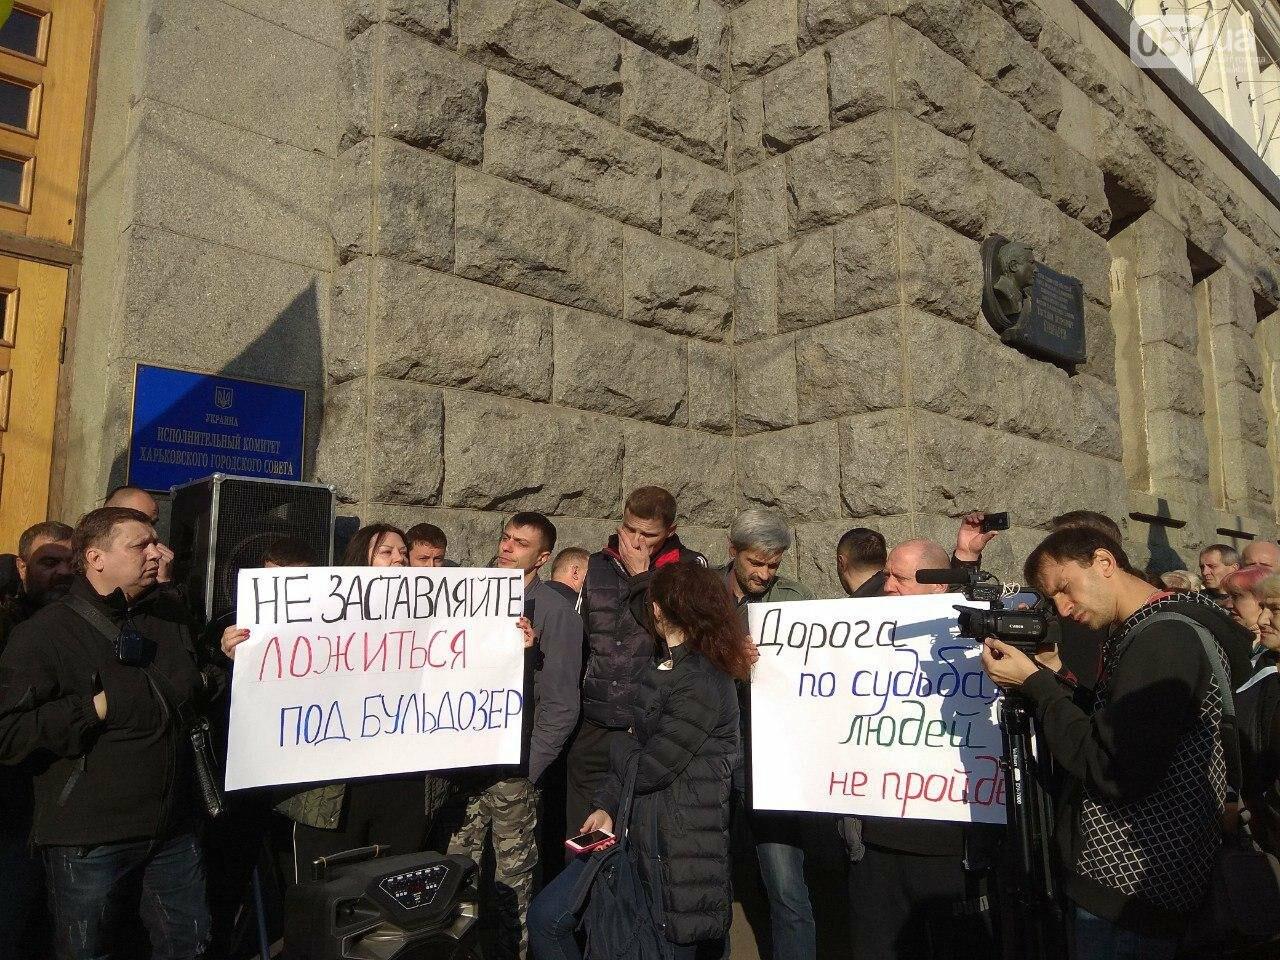 «Нам дорога не нужна»: предприниматели «Барабашово» пикетируют горсовет, - ФОТО, фото-3